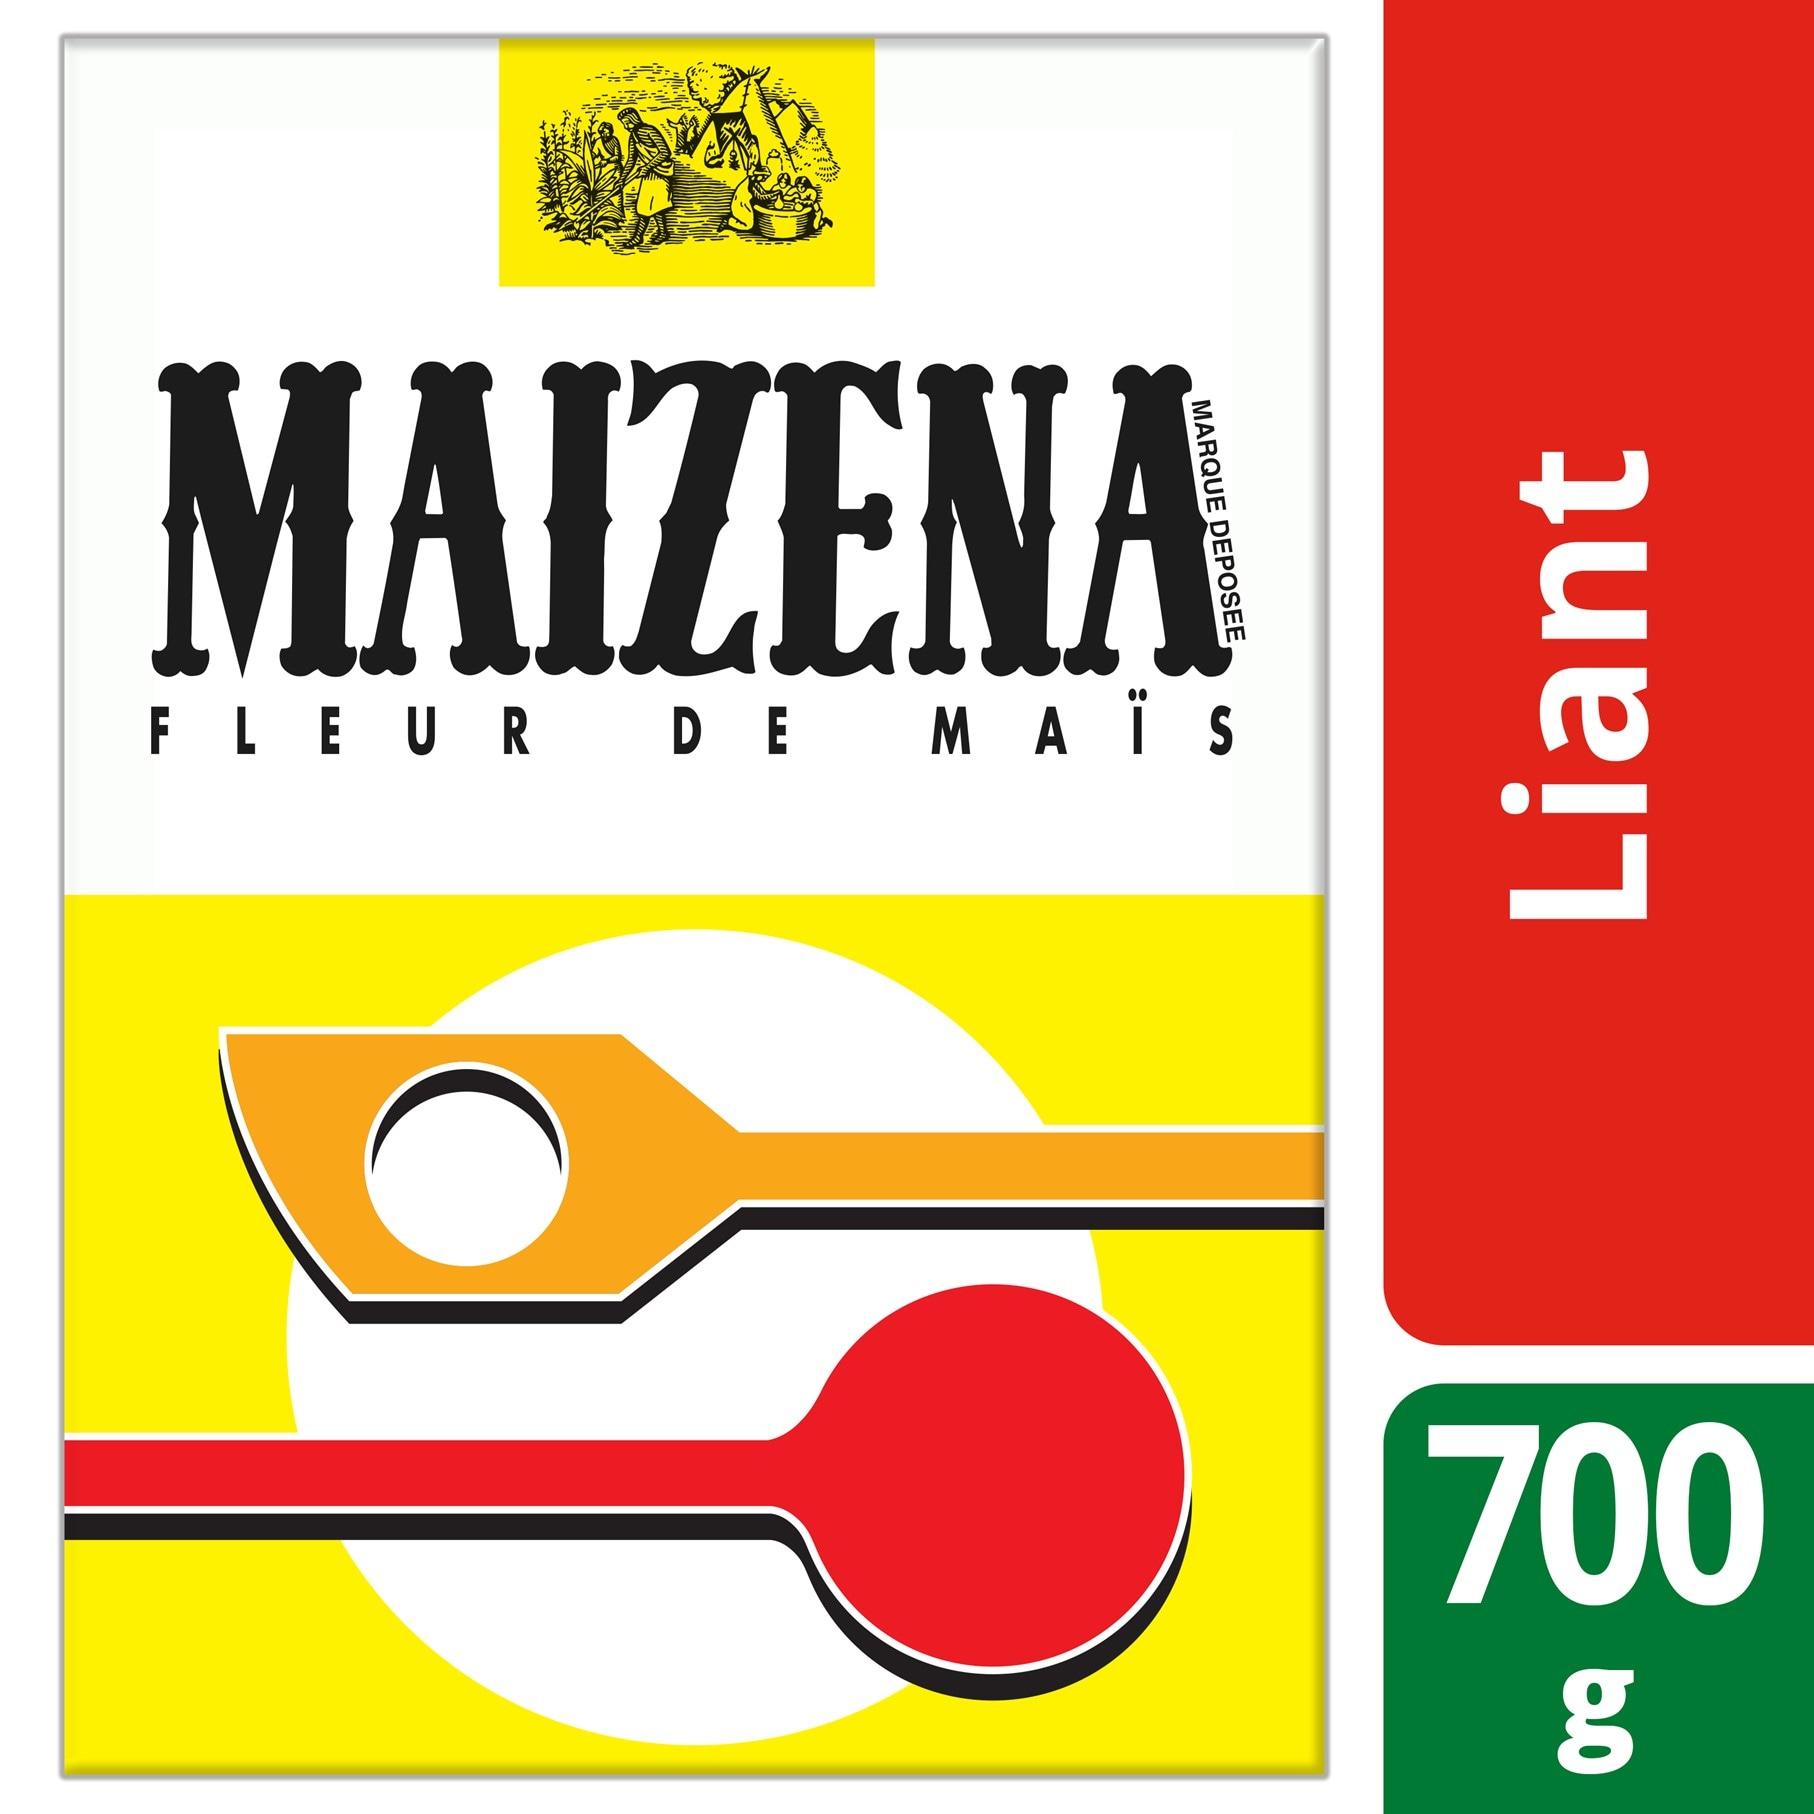 Maizena Fleur de maïs 700g - Avec Fleur de Maïs Maïzena®, allégez vos desserts gourmands.*